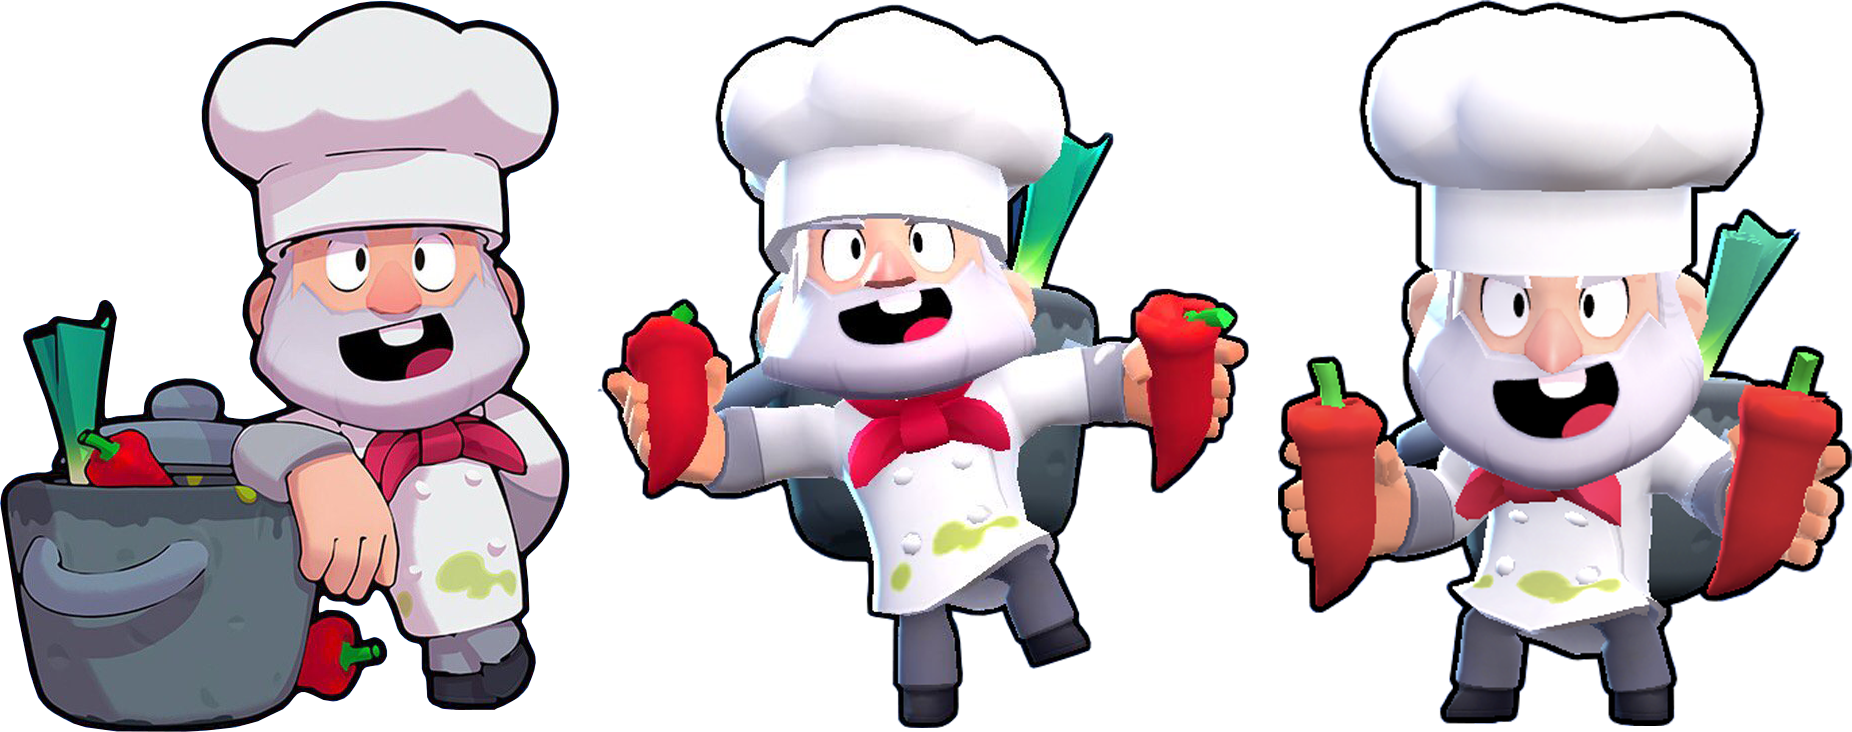 Mike cucina in varie pose